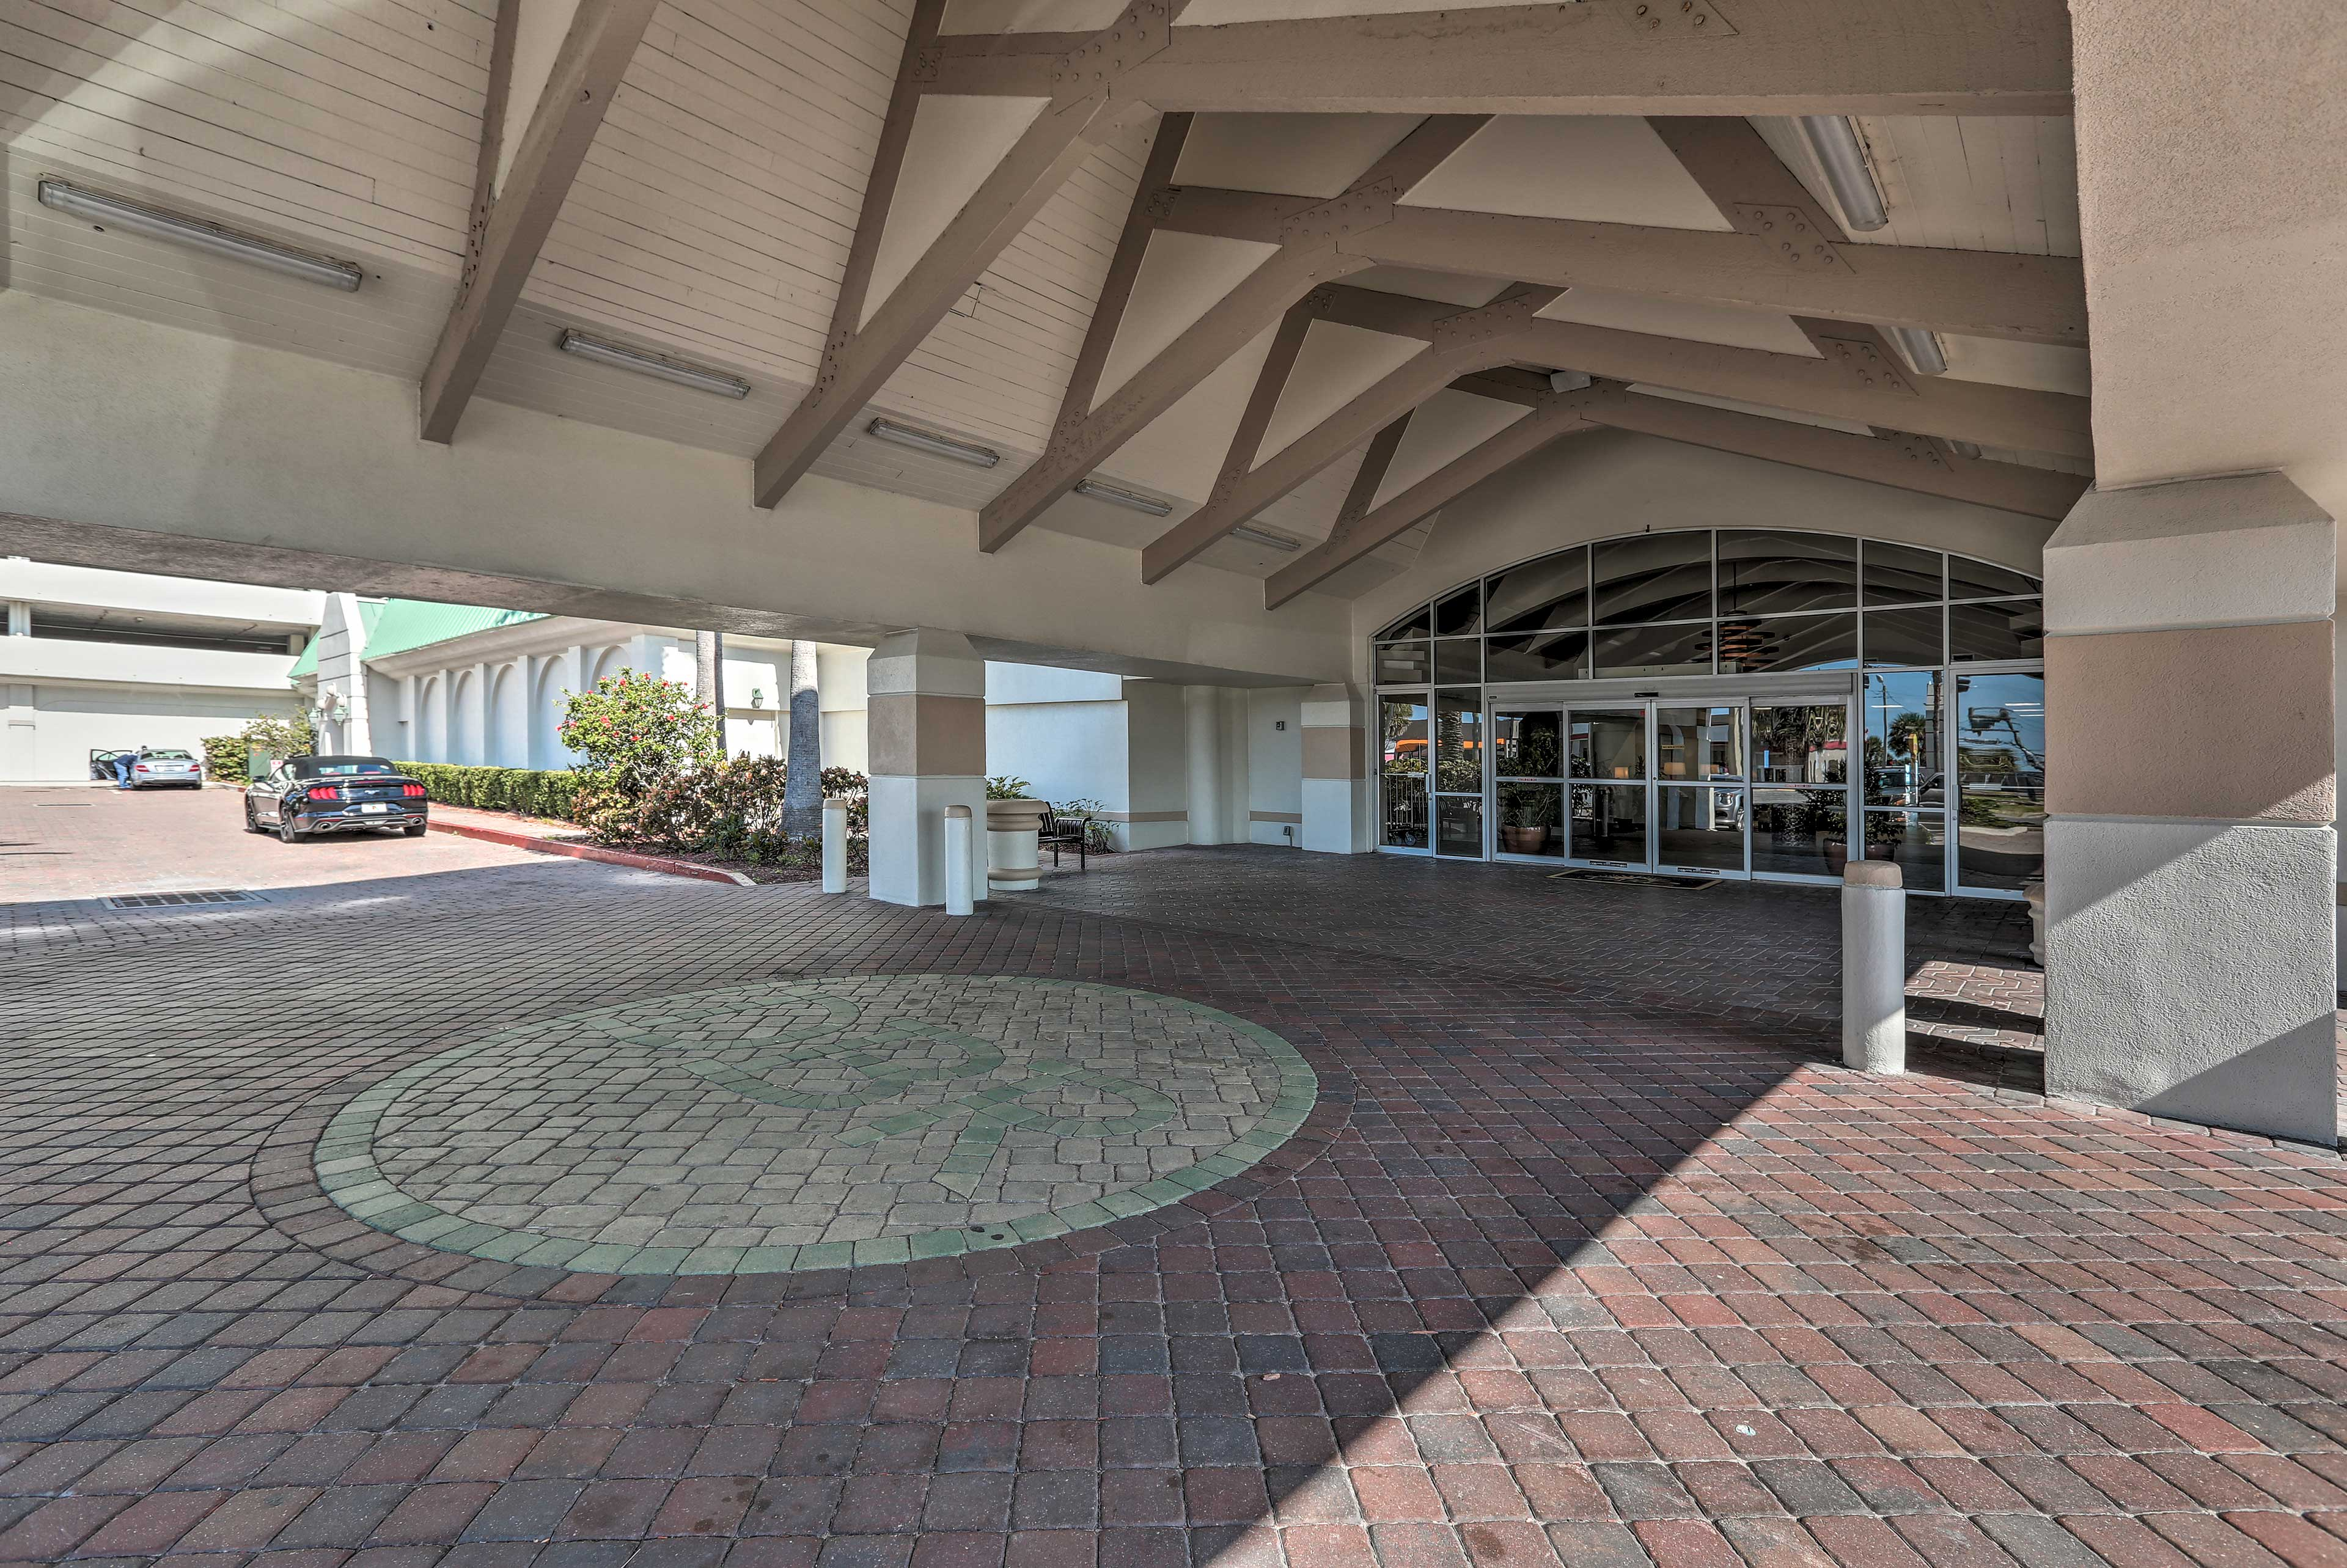 You'll love staying at the Daytona Beach Resort!